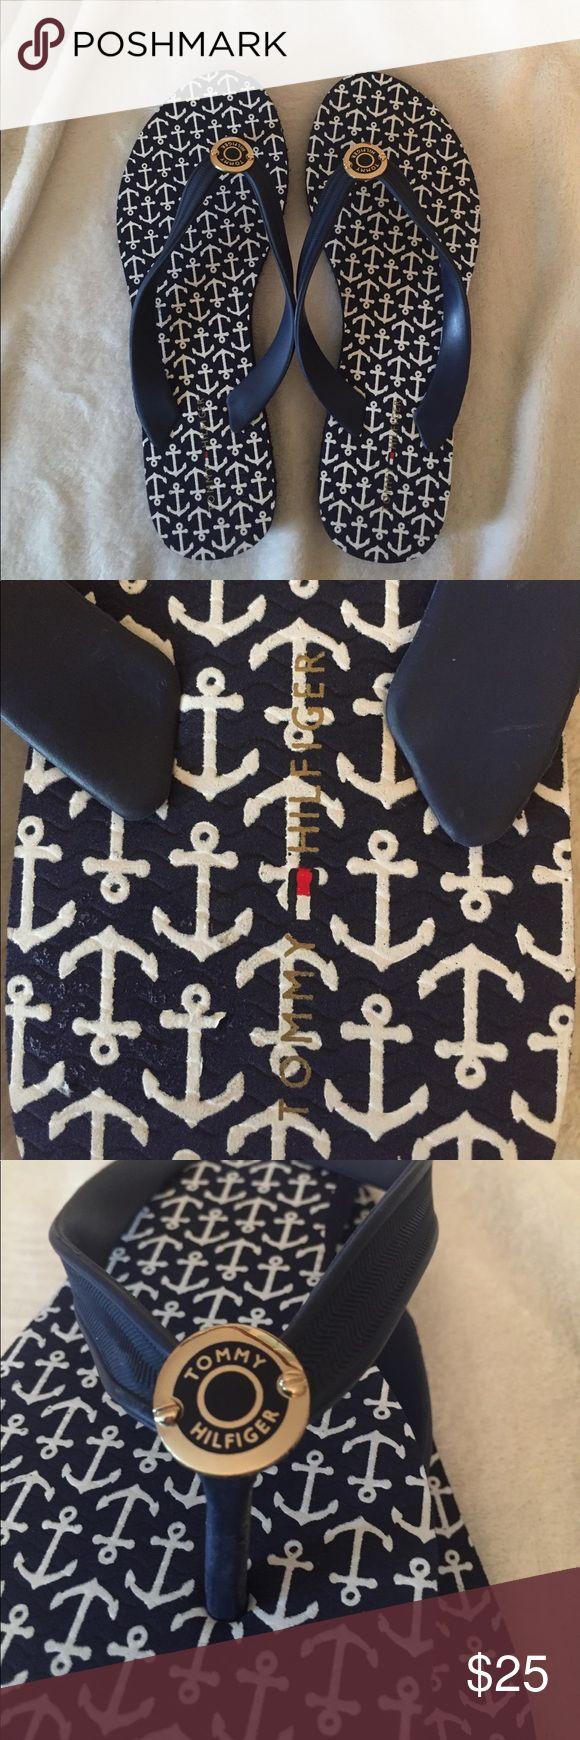 Tommy Hilfiger flip flops. Dark blue size 7. NWT. Tommy Hilfiger flip flops in a dark blue with anchors. Size 7. New with tags. NWT Tommy Hilfiger Shoes Sandals